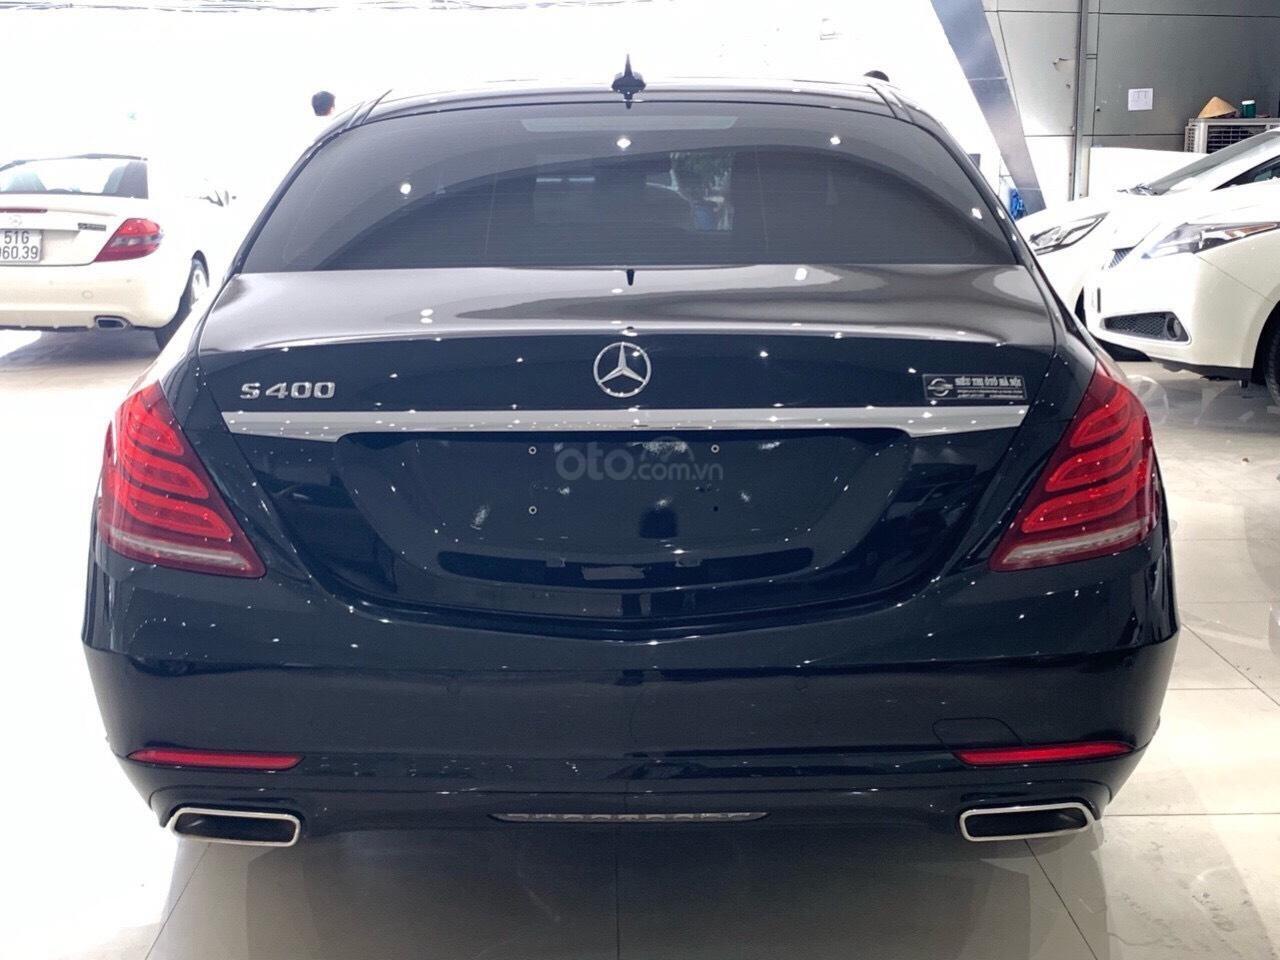 Bán Mercedes S400 2016, màu đen (4)